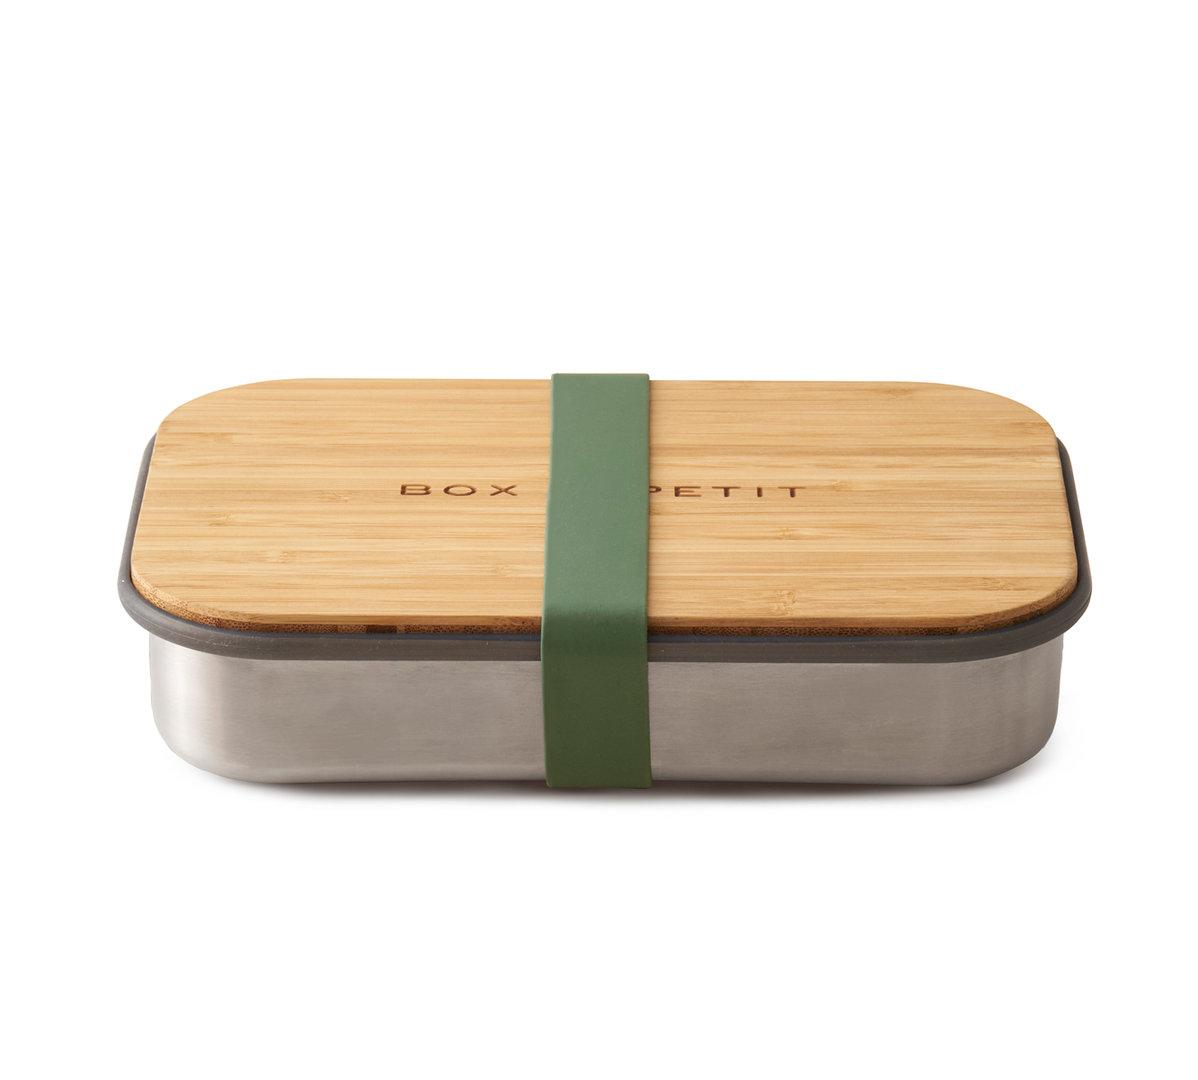 black blum sandwich on board olive neu ovp edelstahl box m schneidebrett holz ebay. Black Bedroom Furniture Sets. Home Design Ideas